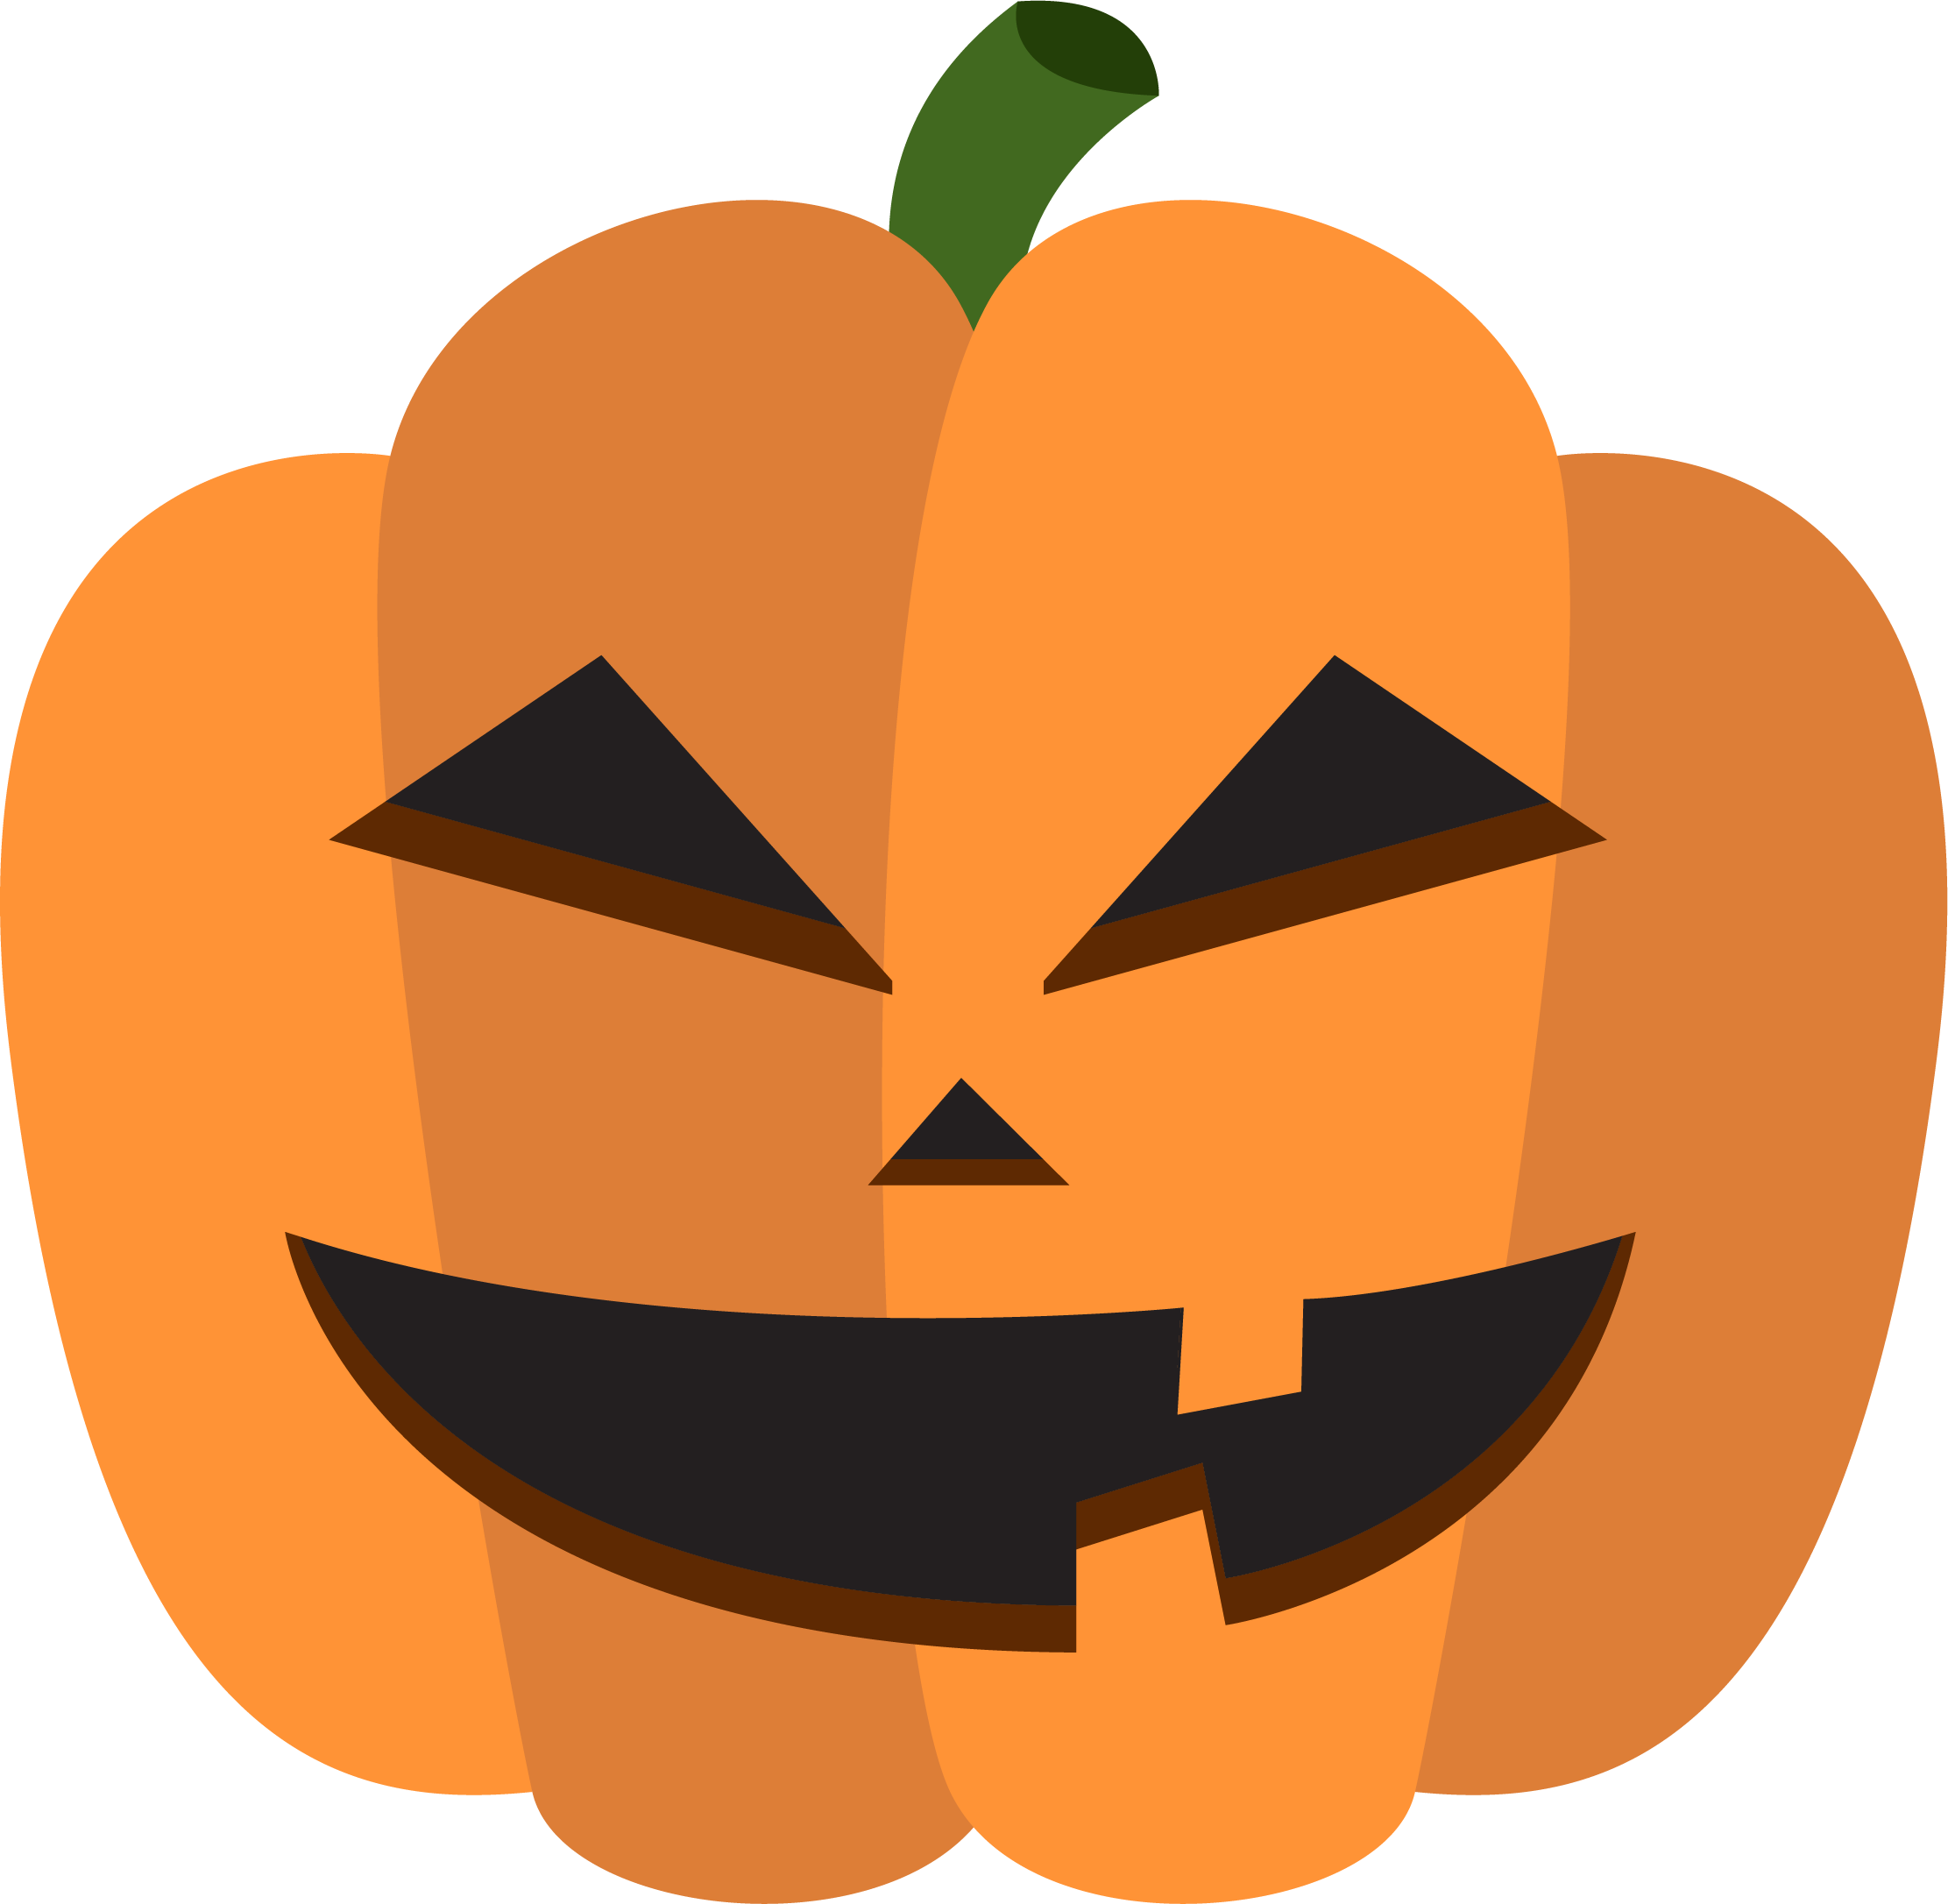 Clipart pumpkin pumpkin decorating. Calabaza halloween decoration cartoon